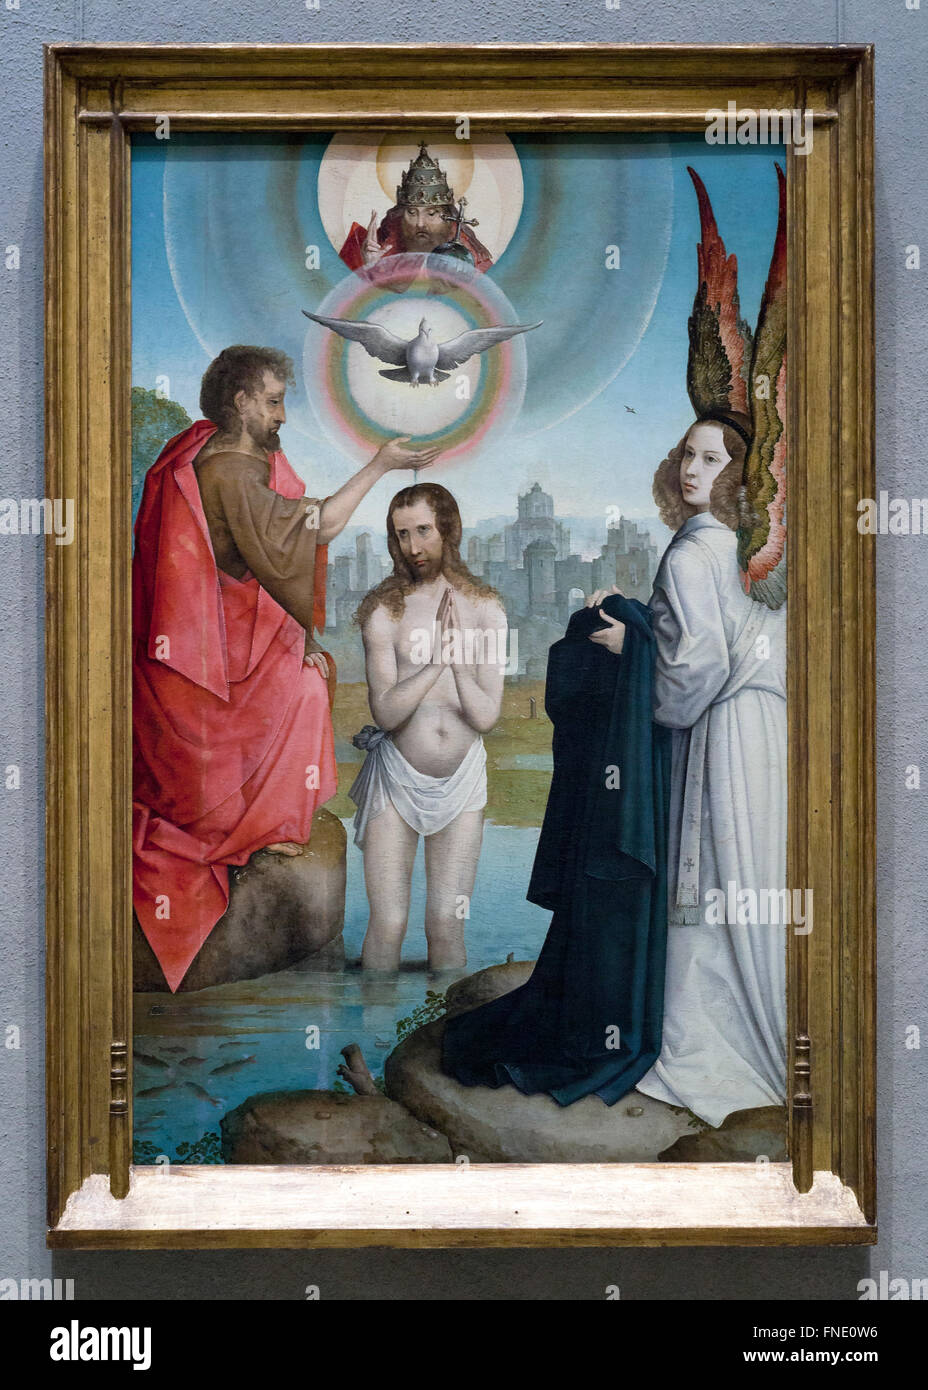 The Baptism of Christ by Juan de Flandes, circa 1508 - Stock Image